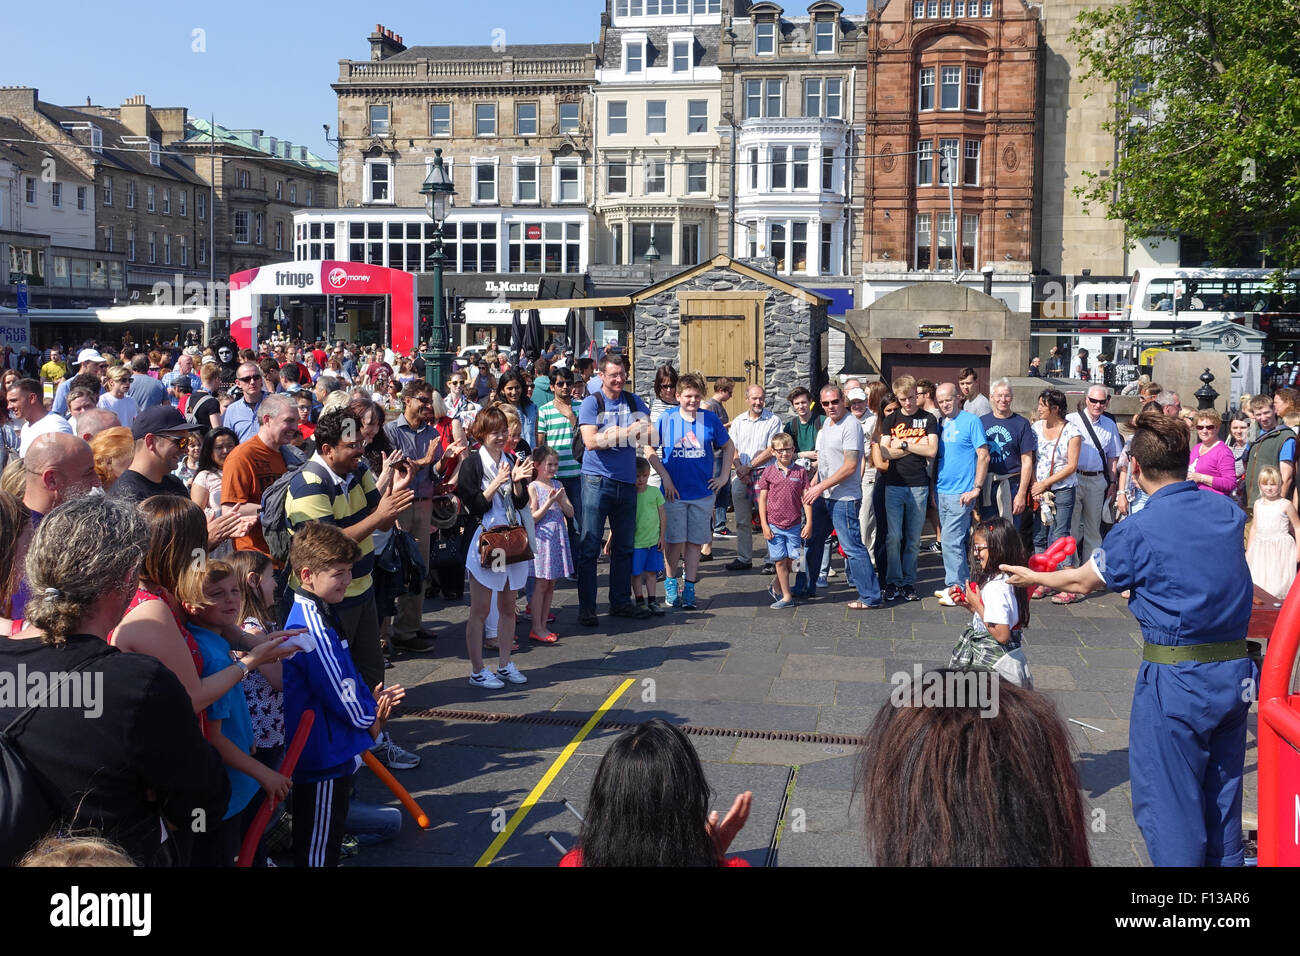 Street Performers, Mound Precinct, during Edinburgh Festival - Stock Image